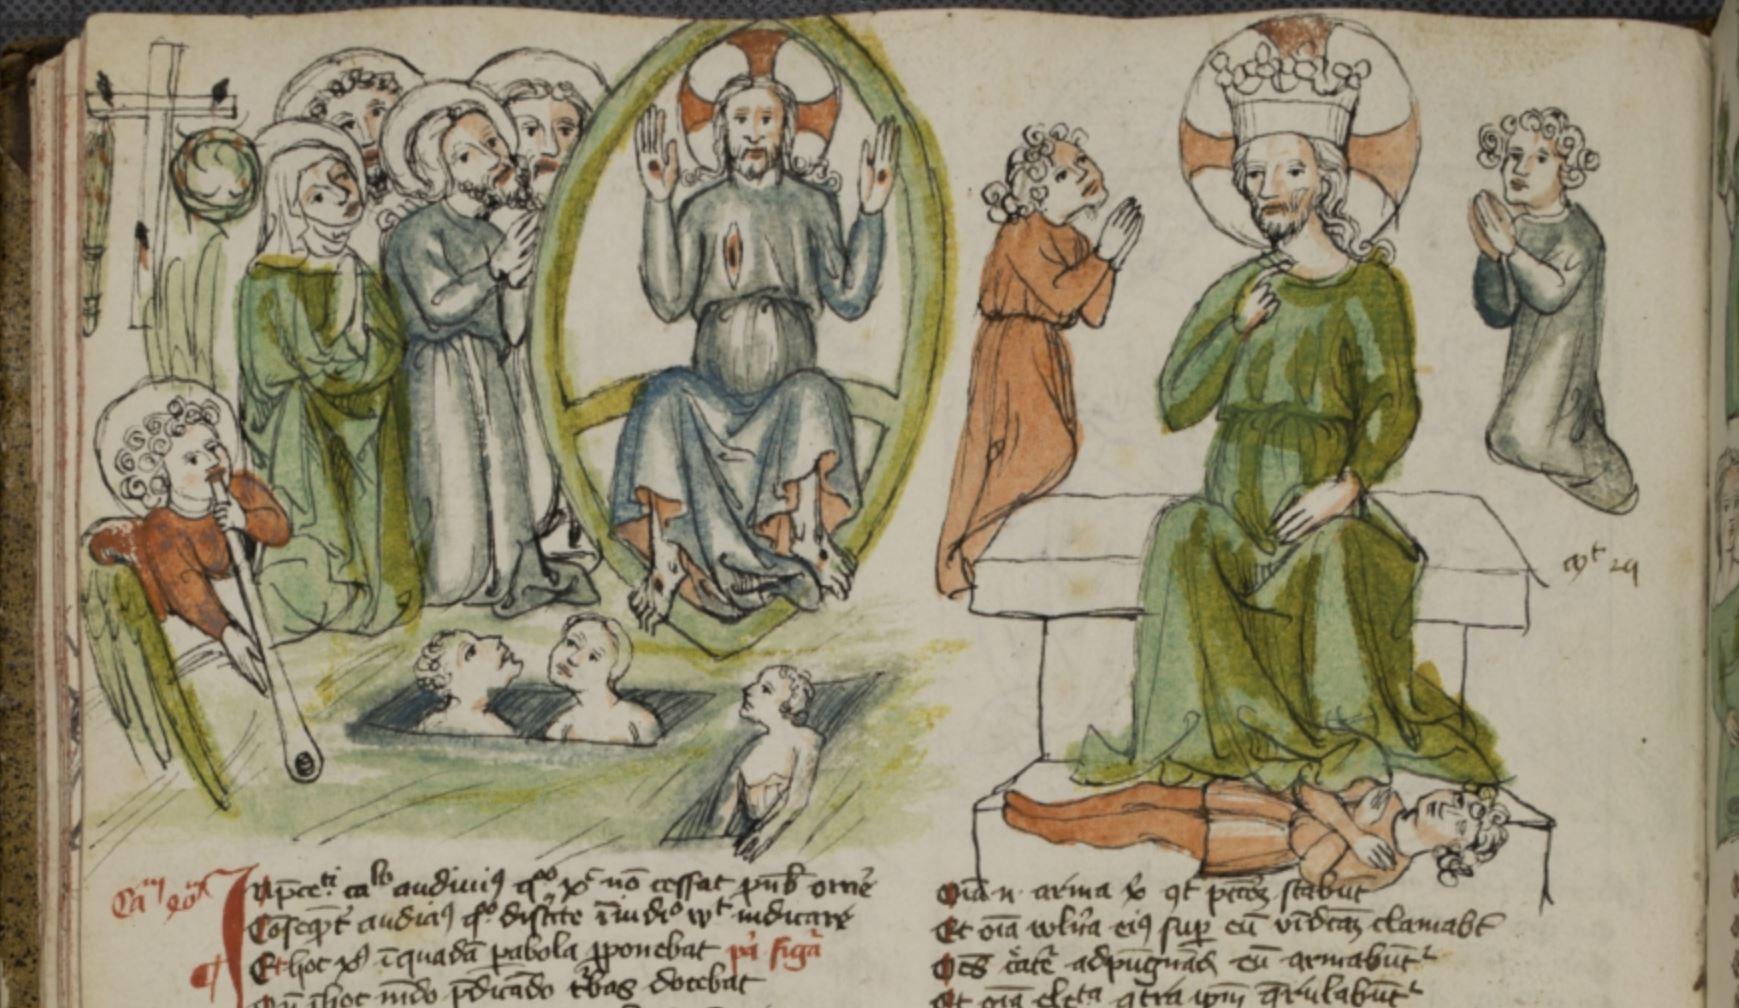 Speculum humanae salvationis, 1400-20, Neustift bei Brixen (Novacella), Stiftsbibliothek, Cod. 166